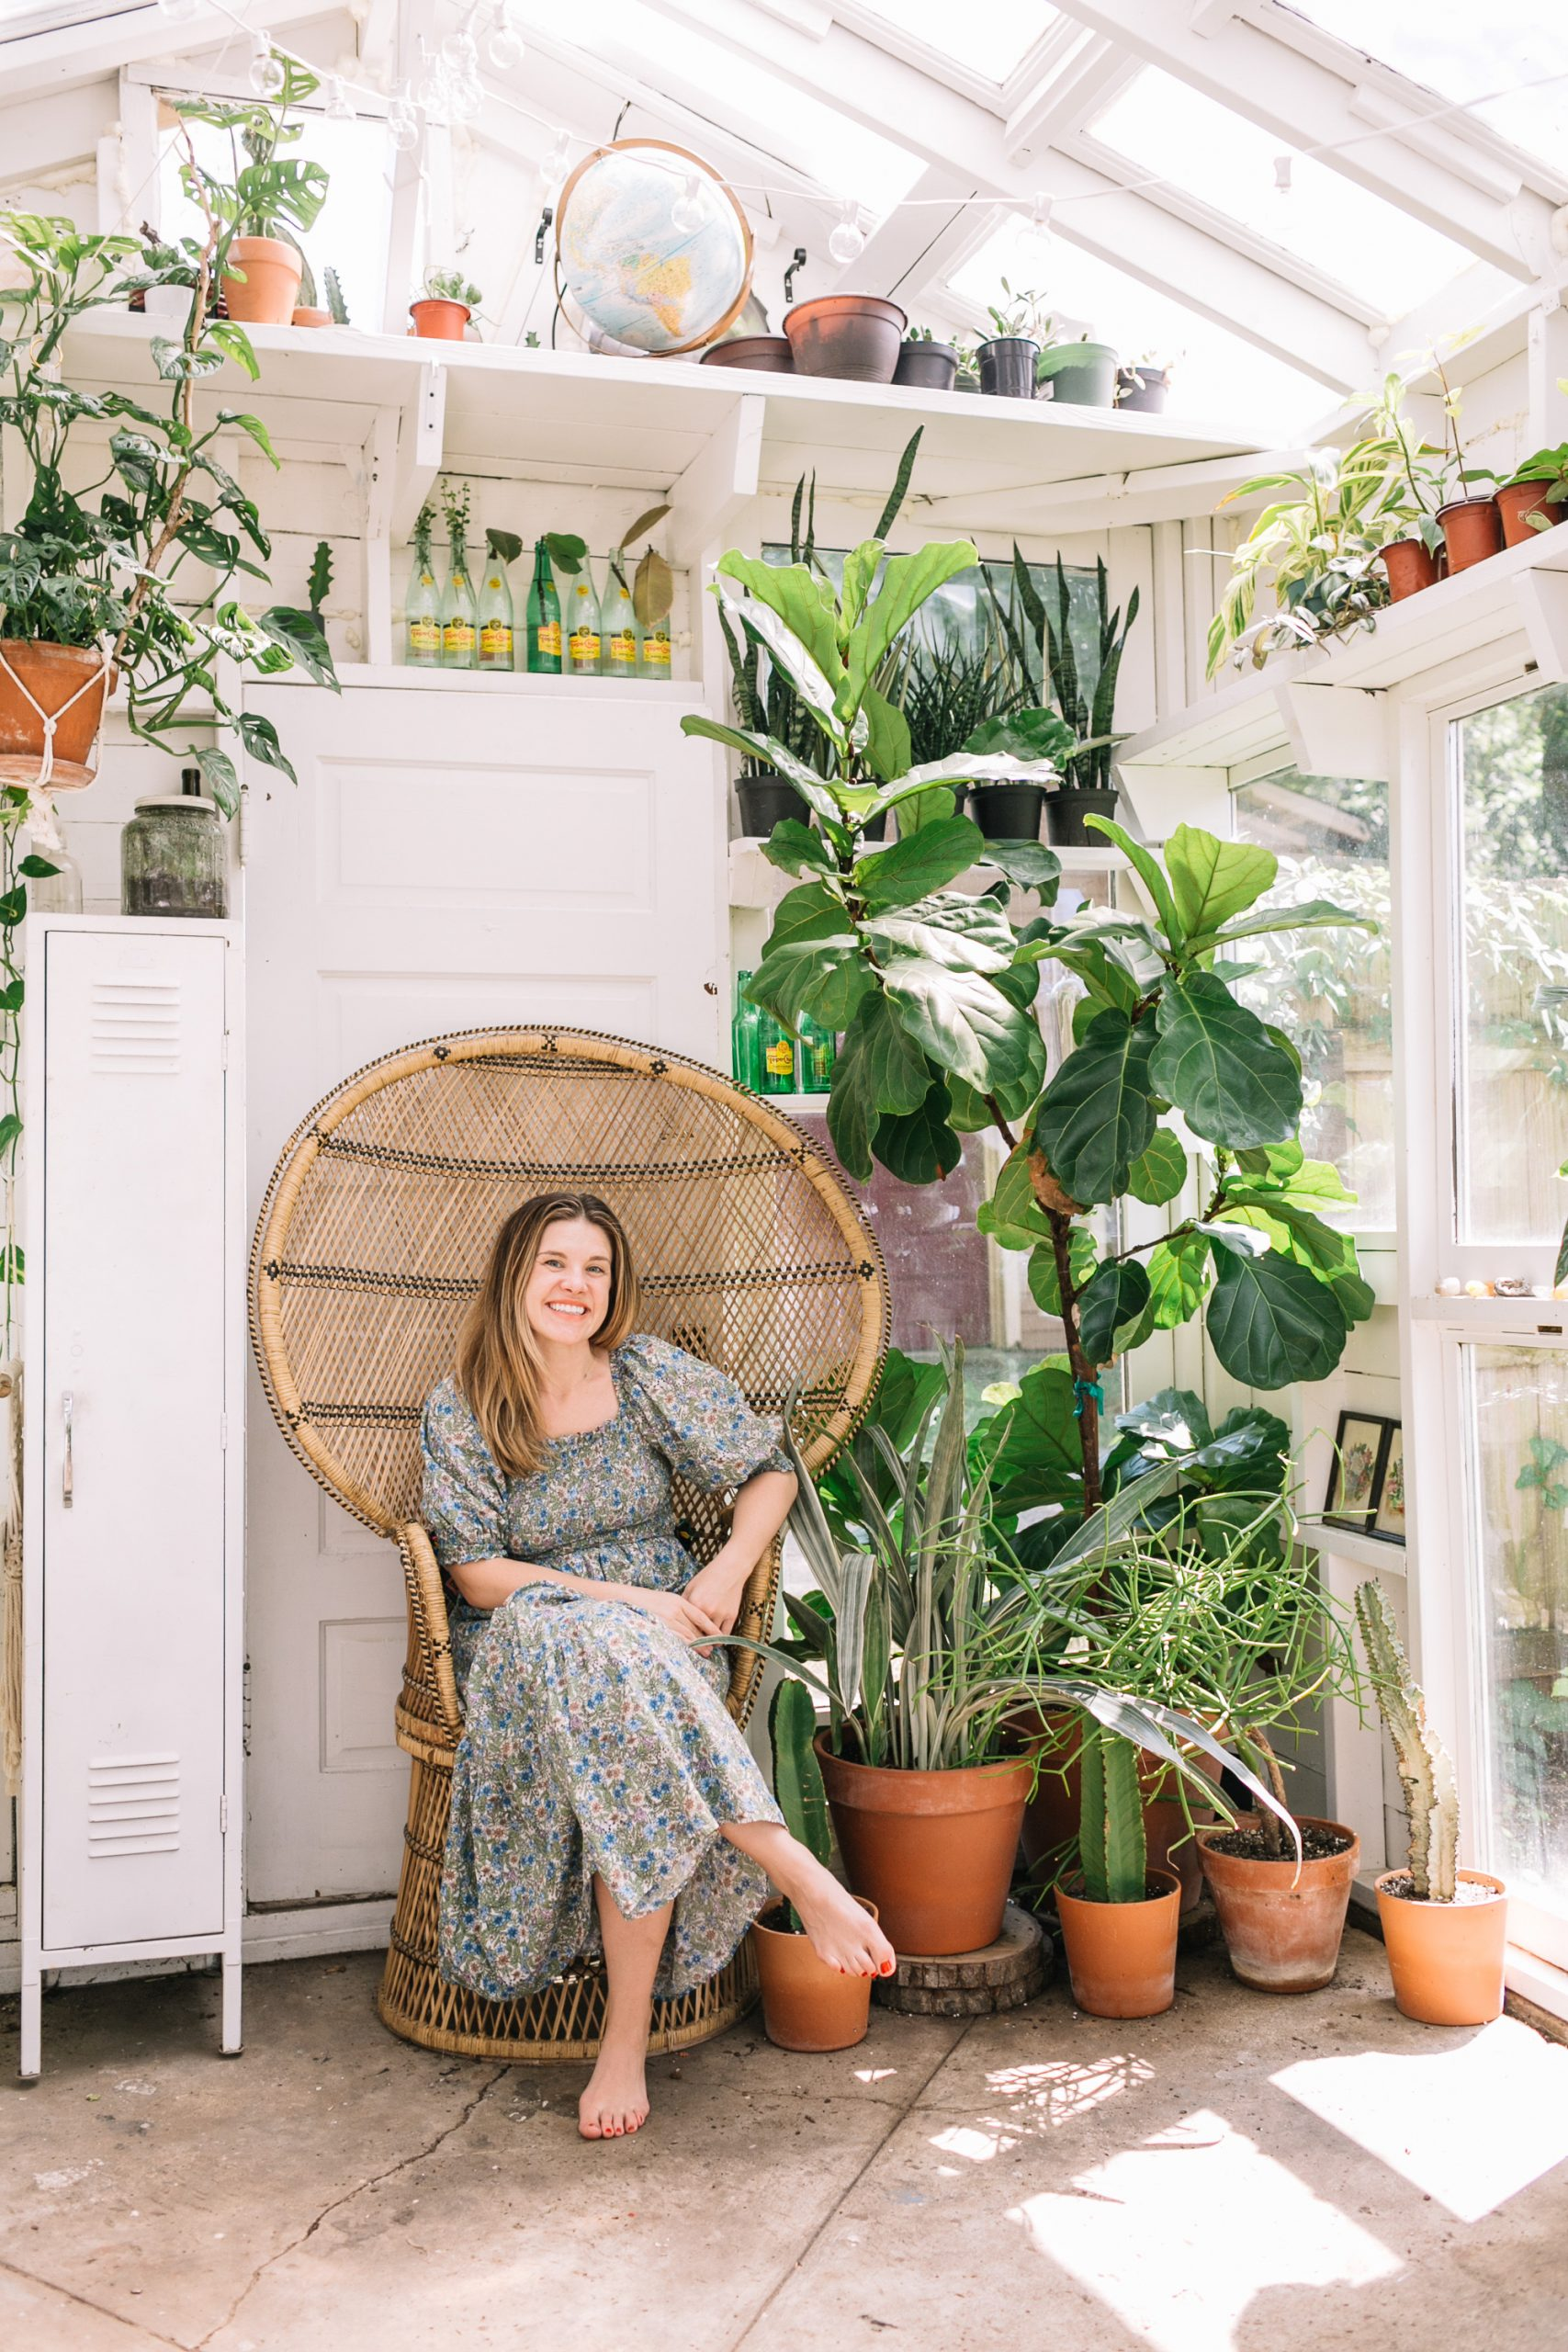 East Nashville Greenhouse plants backyard greenhouse owner Andi Teggart